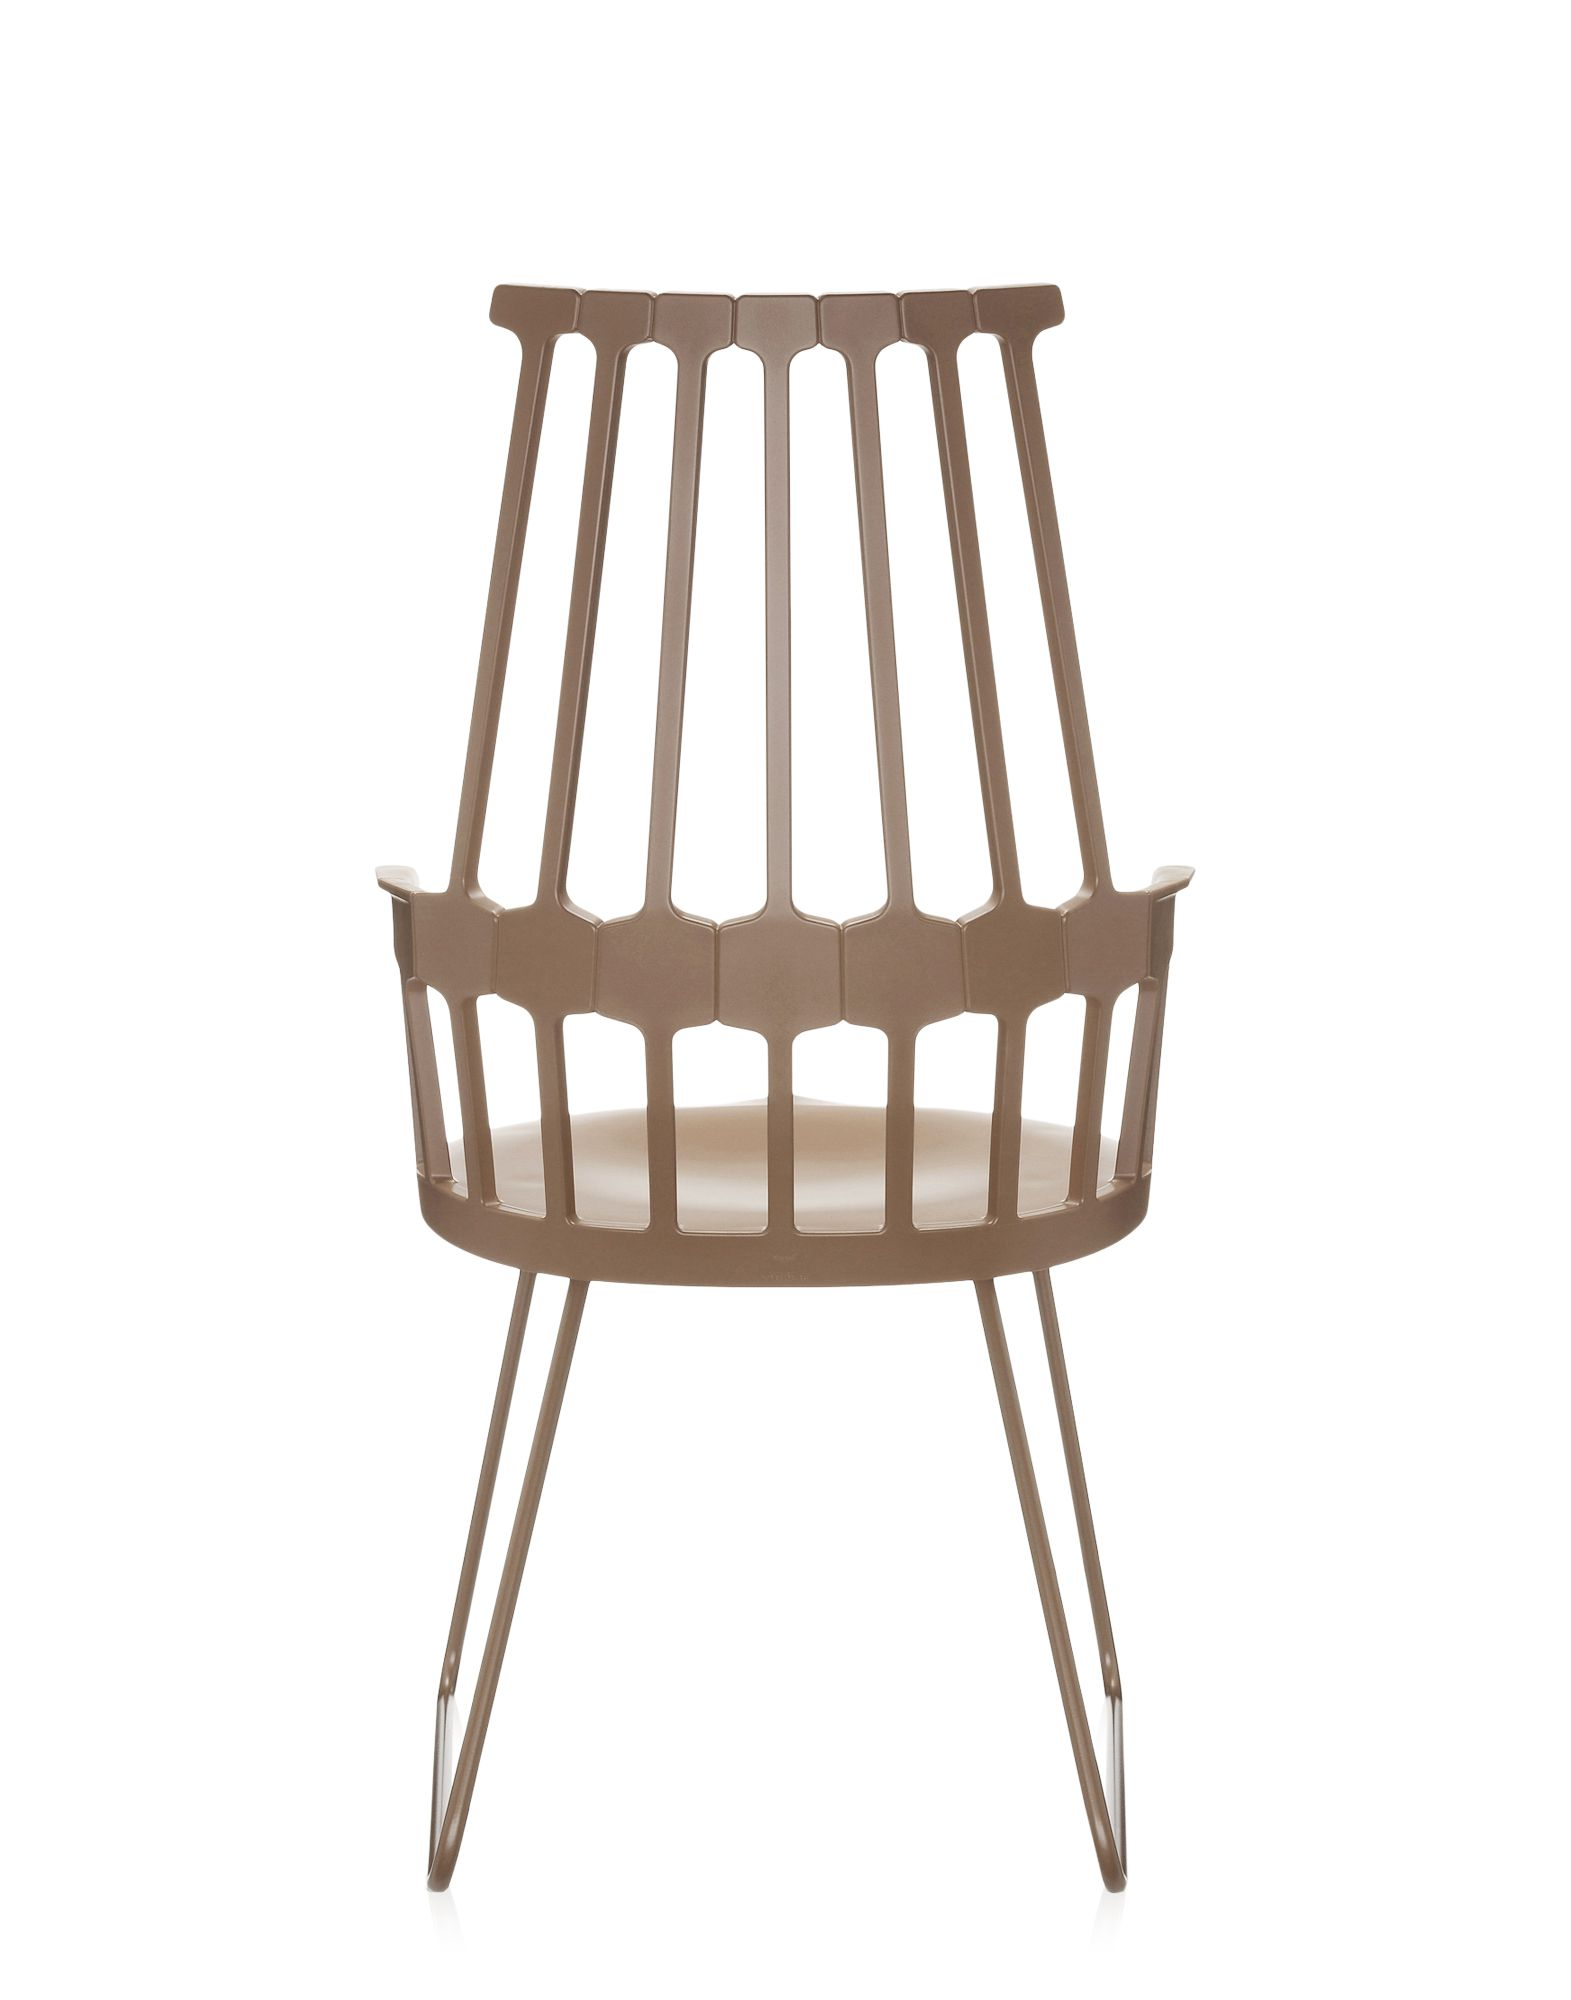 Kartell comback nocciola sedie design newformsdesign for Sedie design kartell